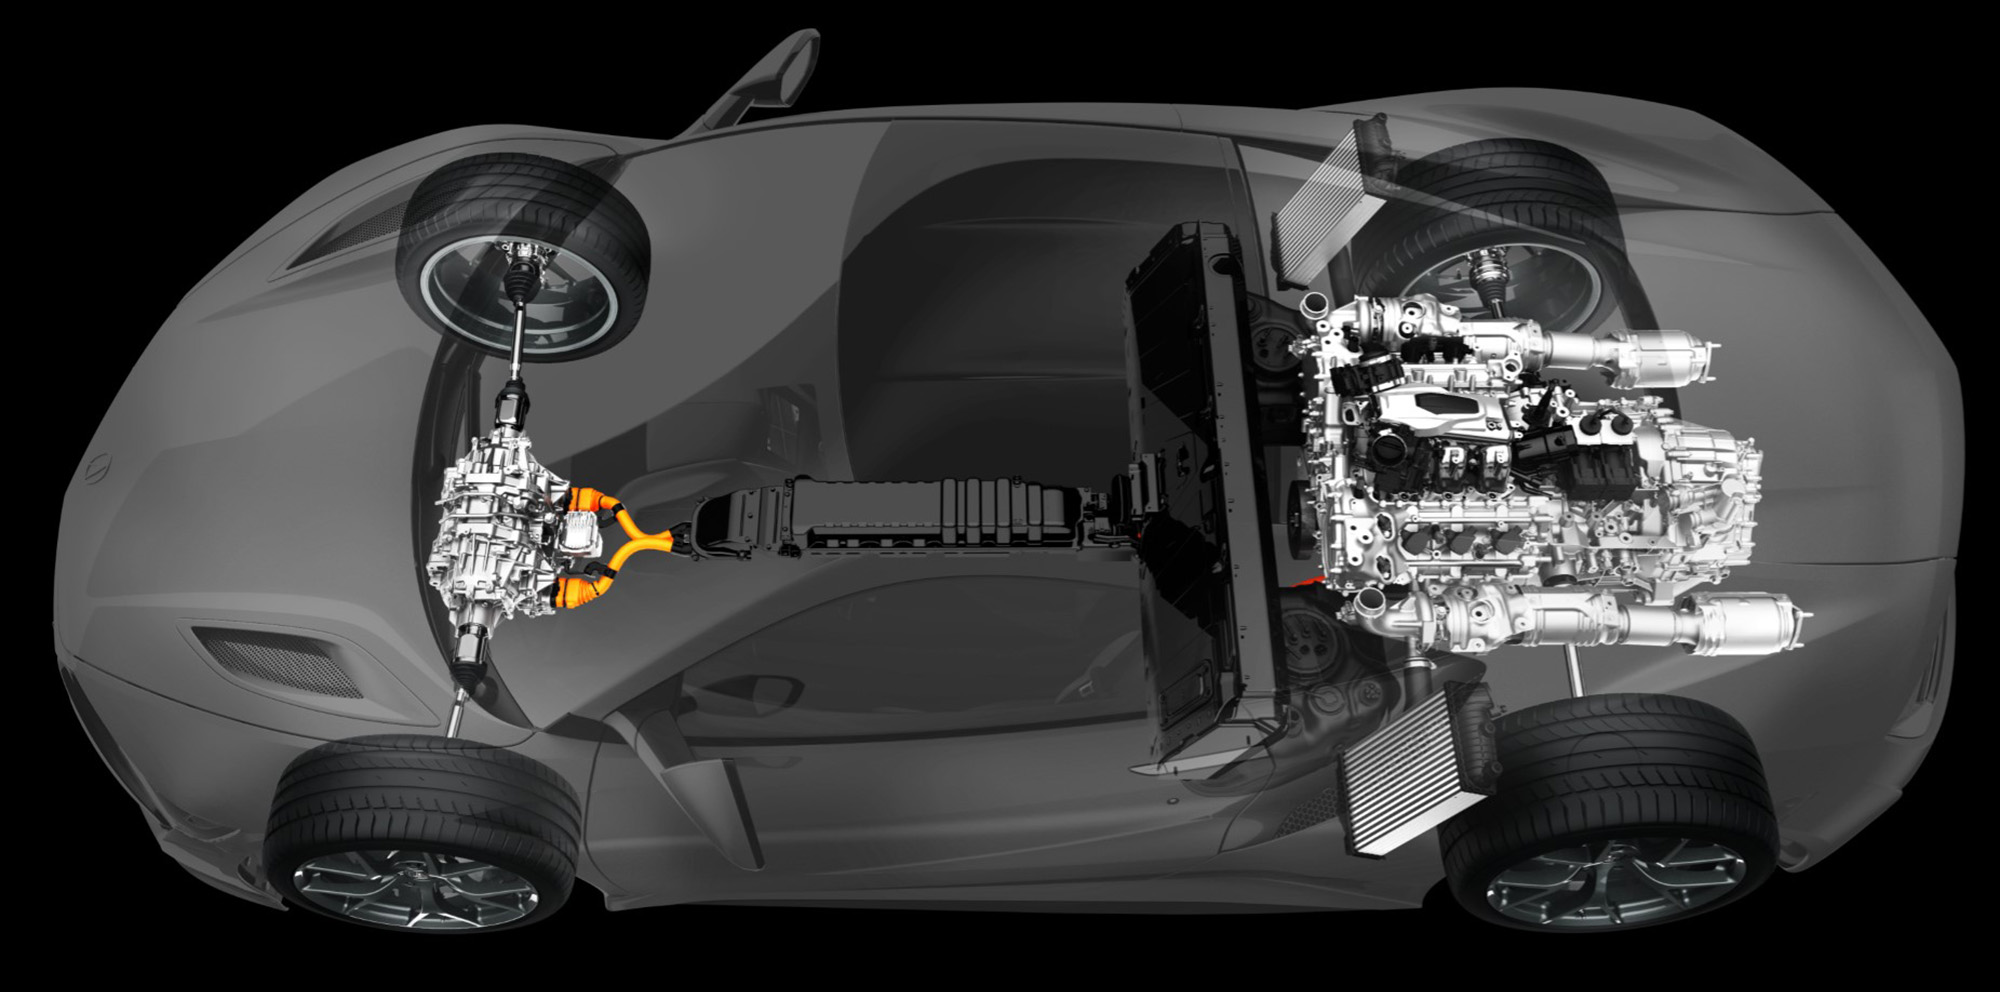 honda acura nsx concept with longitudinal rear mid engine mount